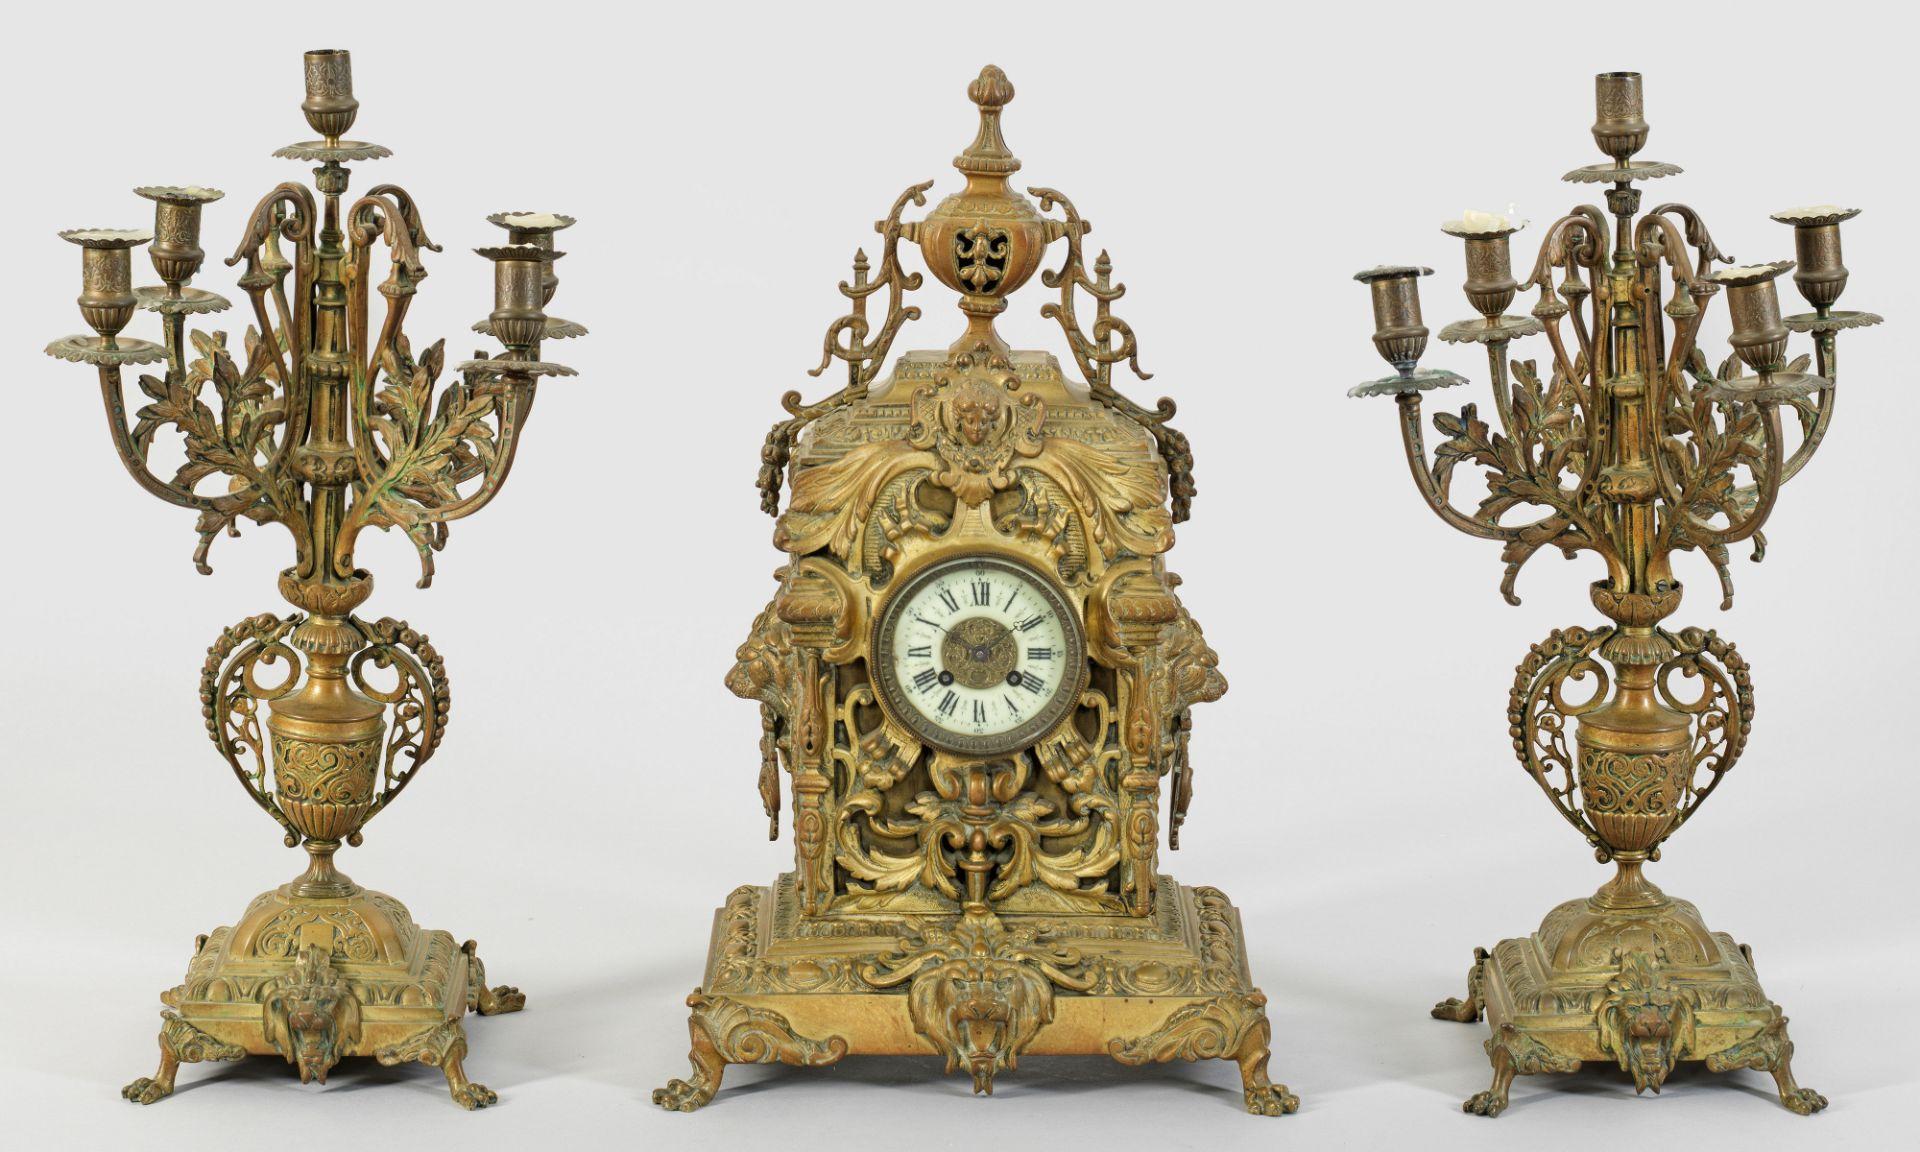 Repräsentative Napoleon III-Uhrengruppe